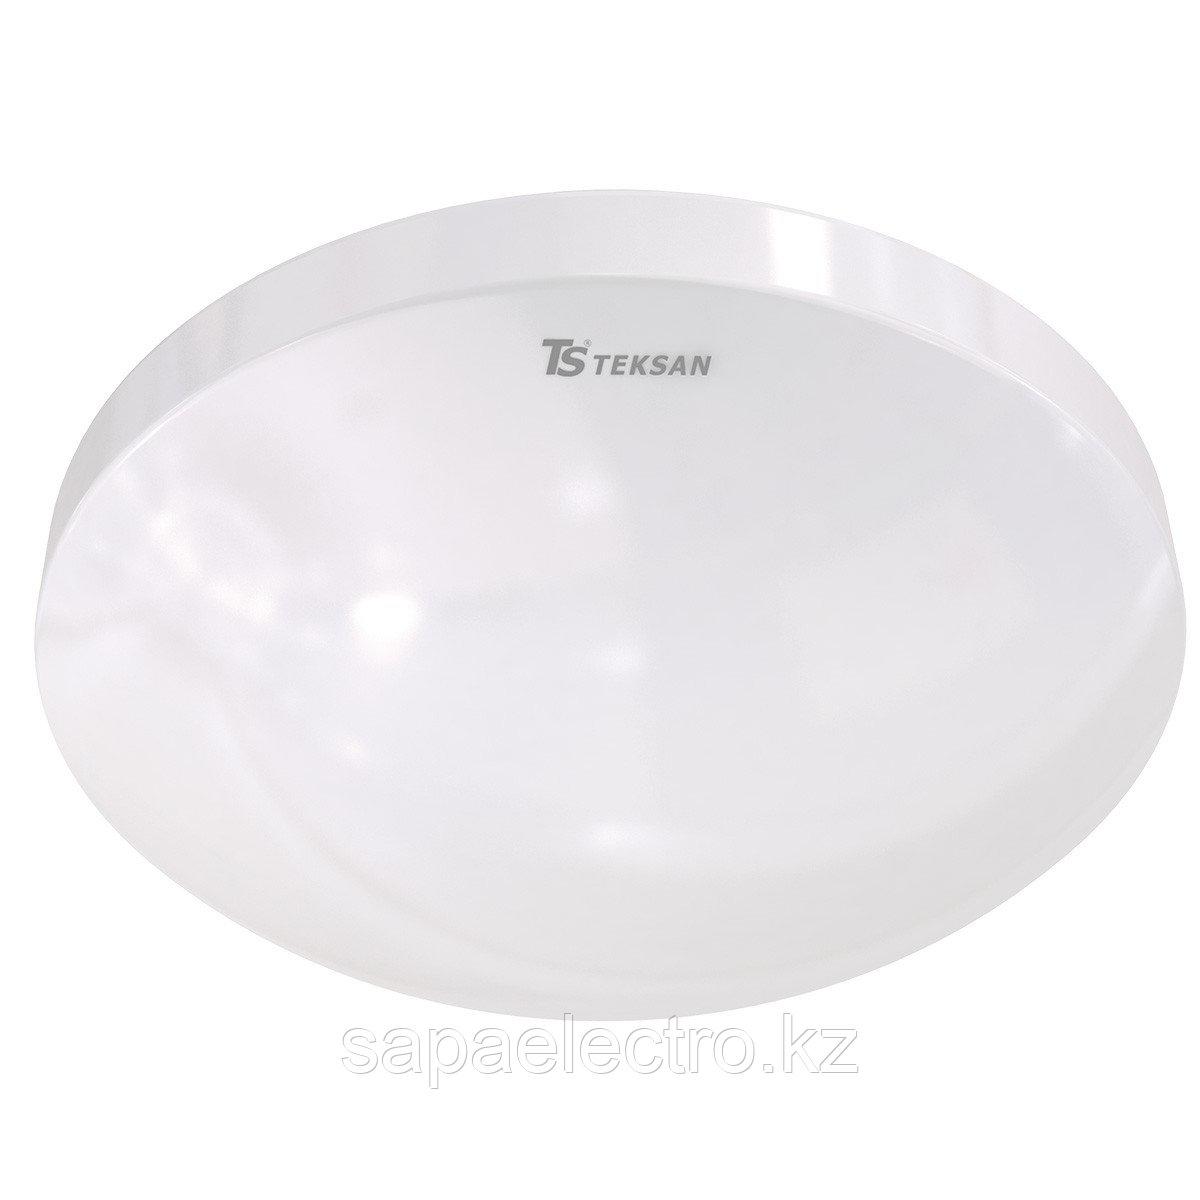 Свет-к LED OMEGA STANDART 22W 6000K 380мм MGL1/10шт